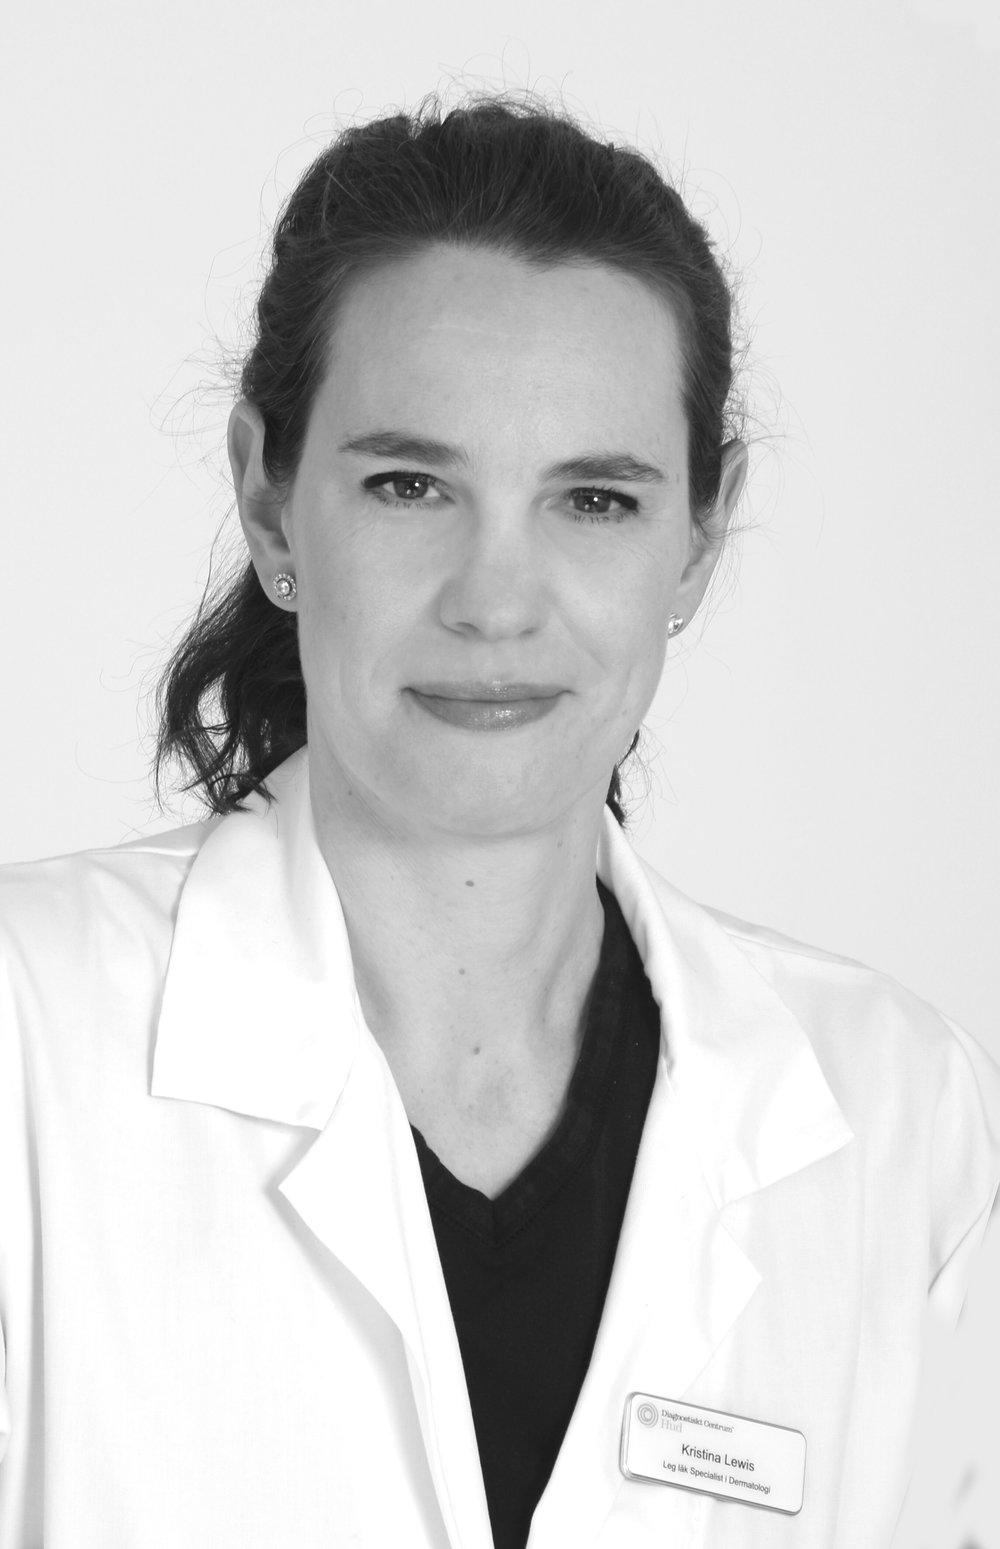 0d31e3de35a Hudläkare - Specialist i Dermatologi